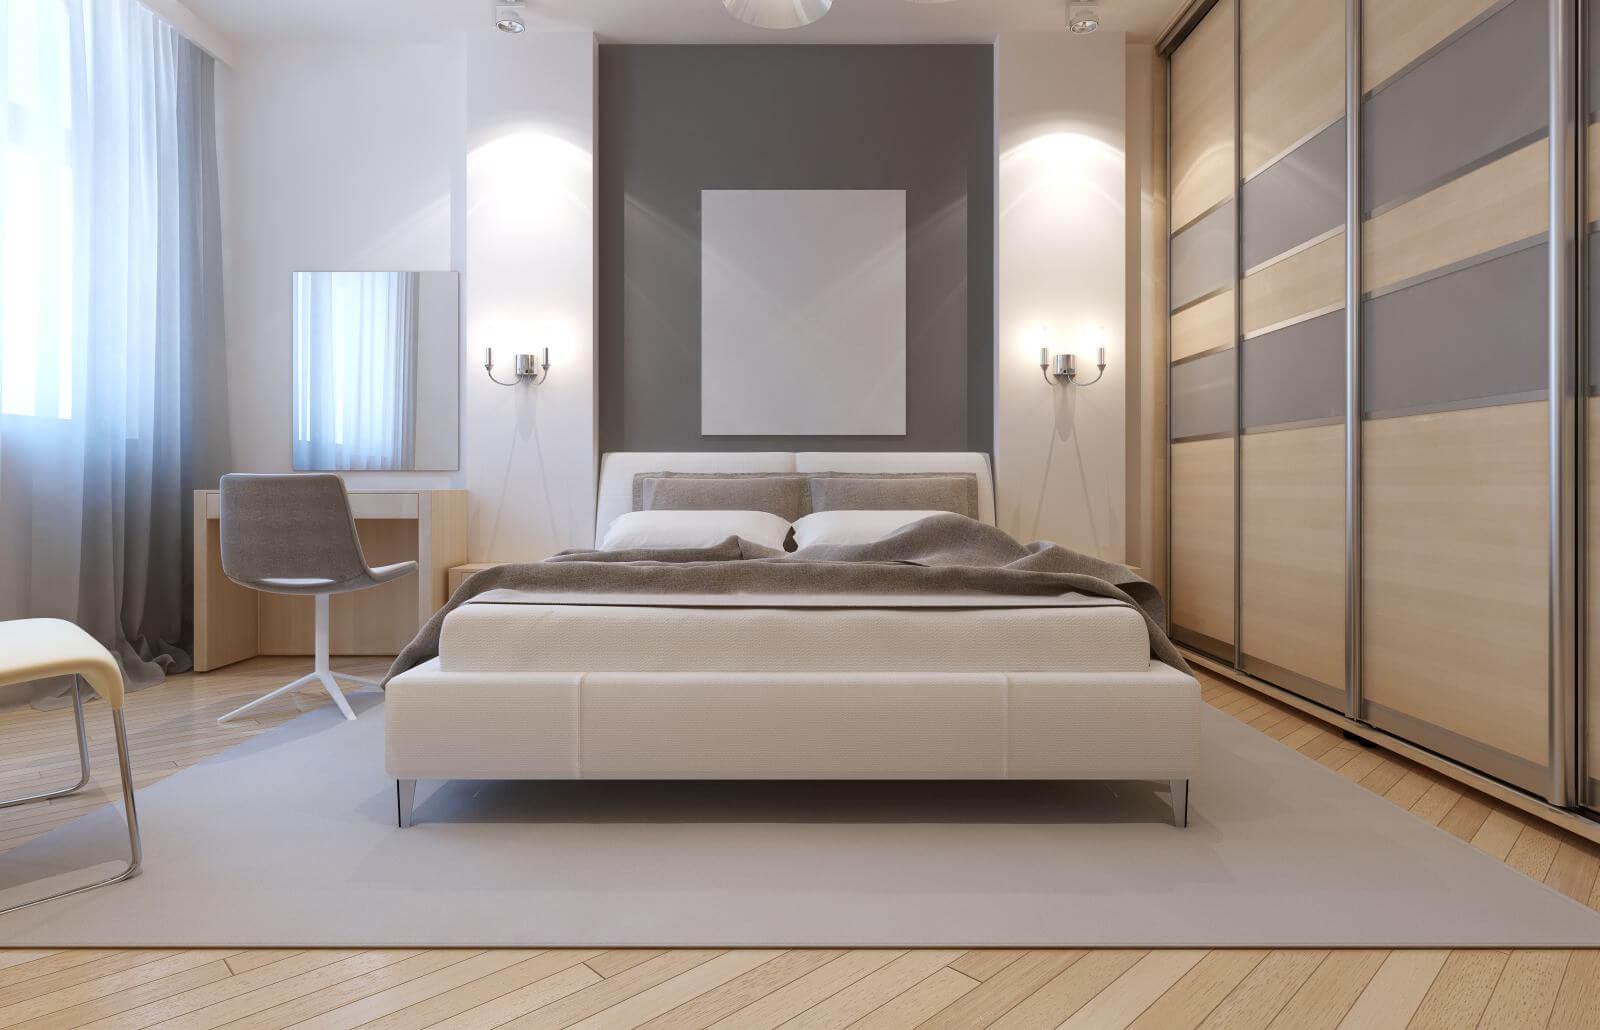 Master bedroom avangard design. Soft double bed, dressing table, closet with sliding doors. 3D render